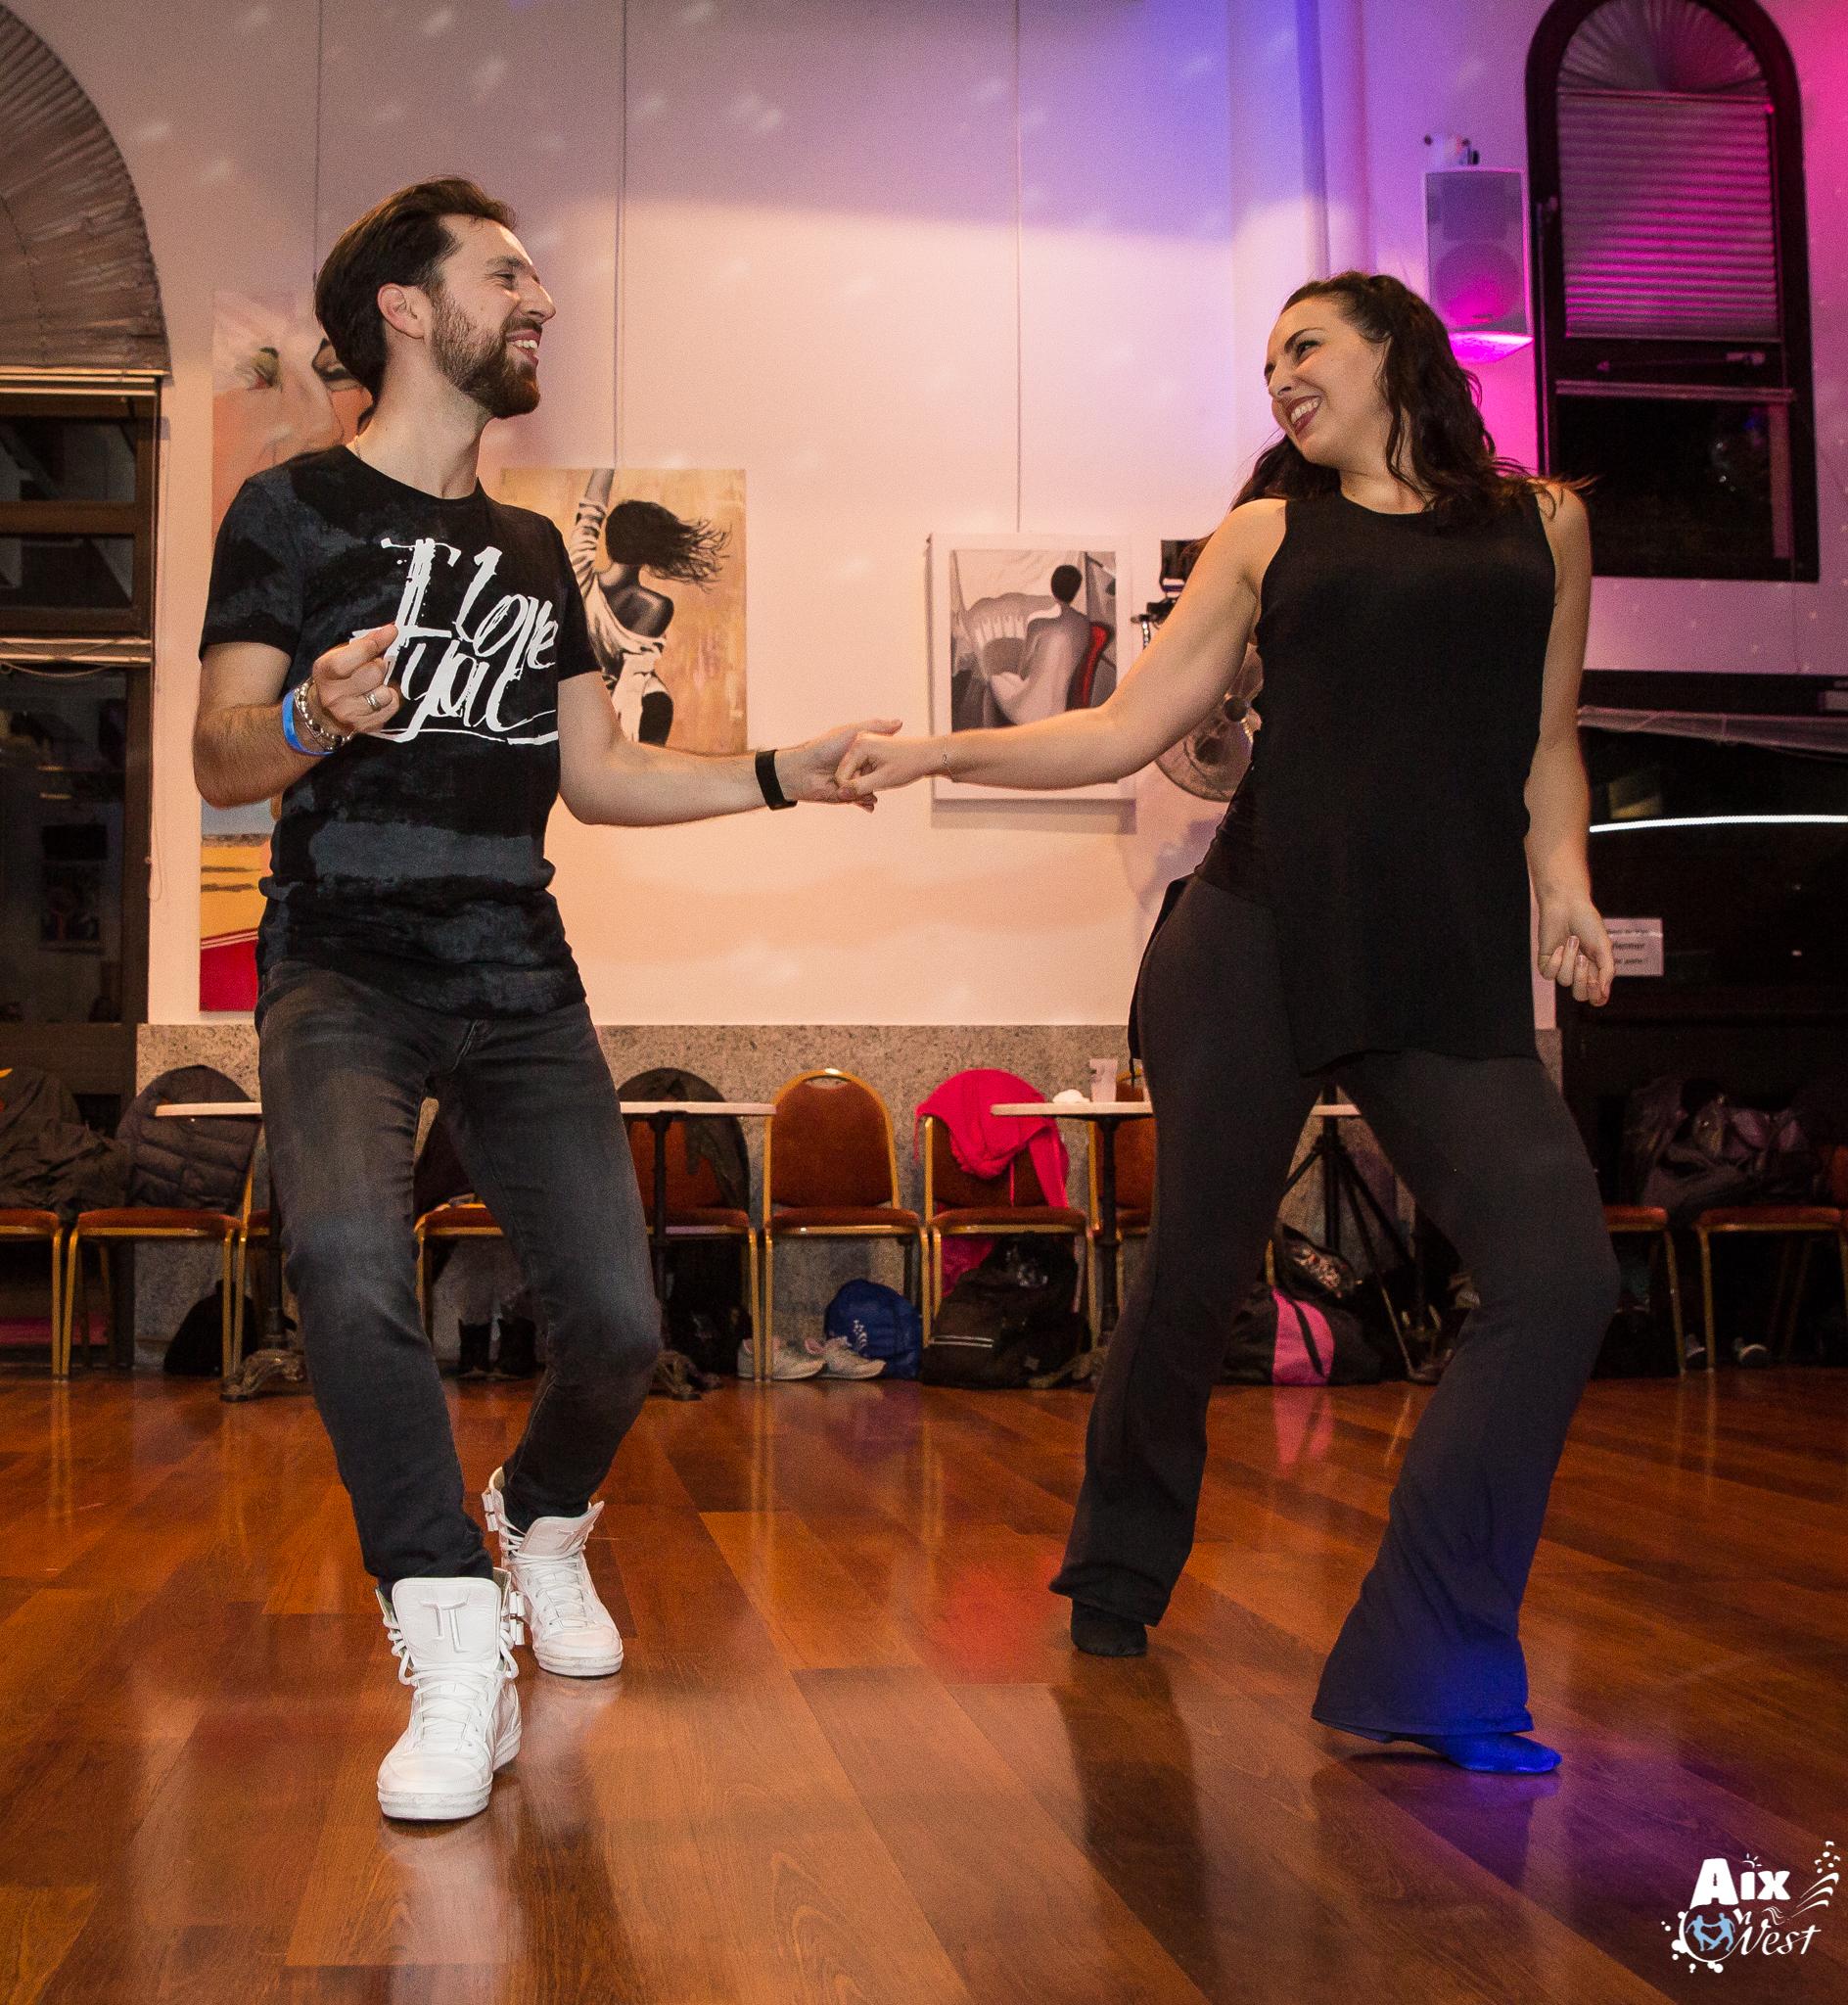 Nicolas & Dianeva